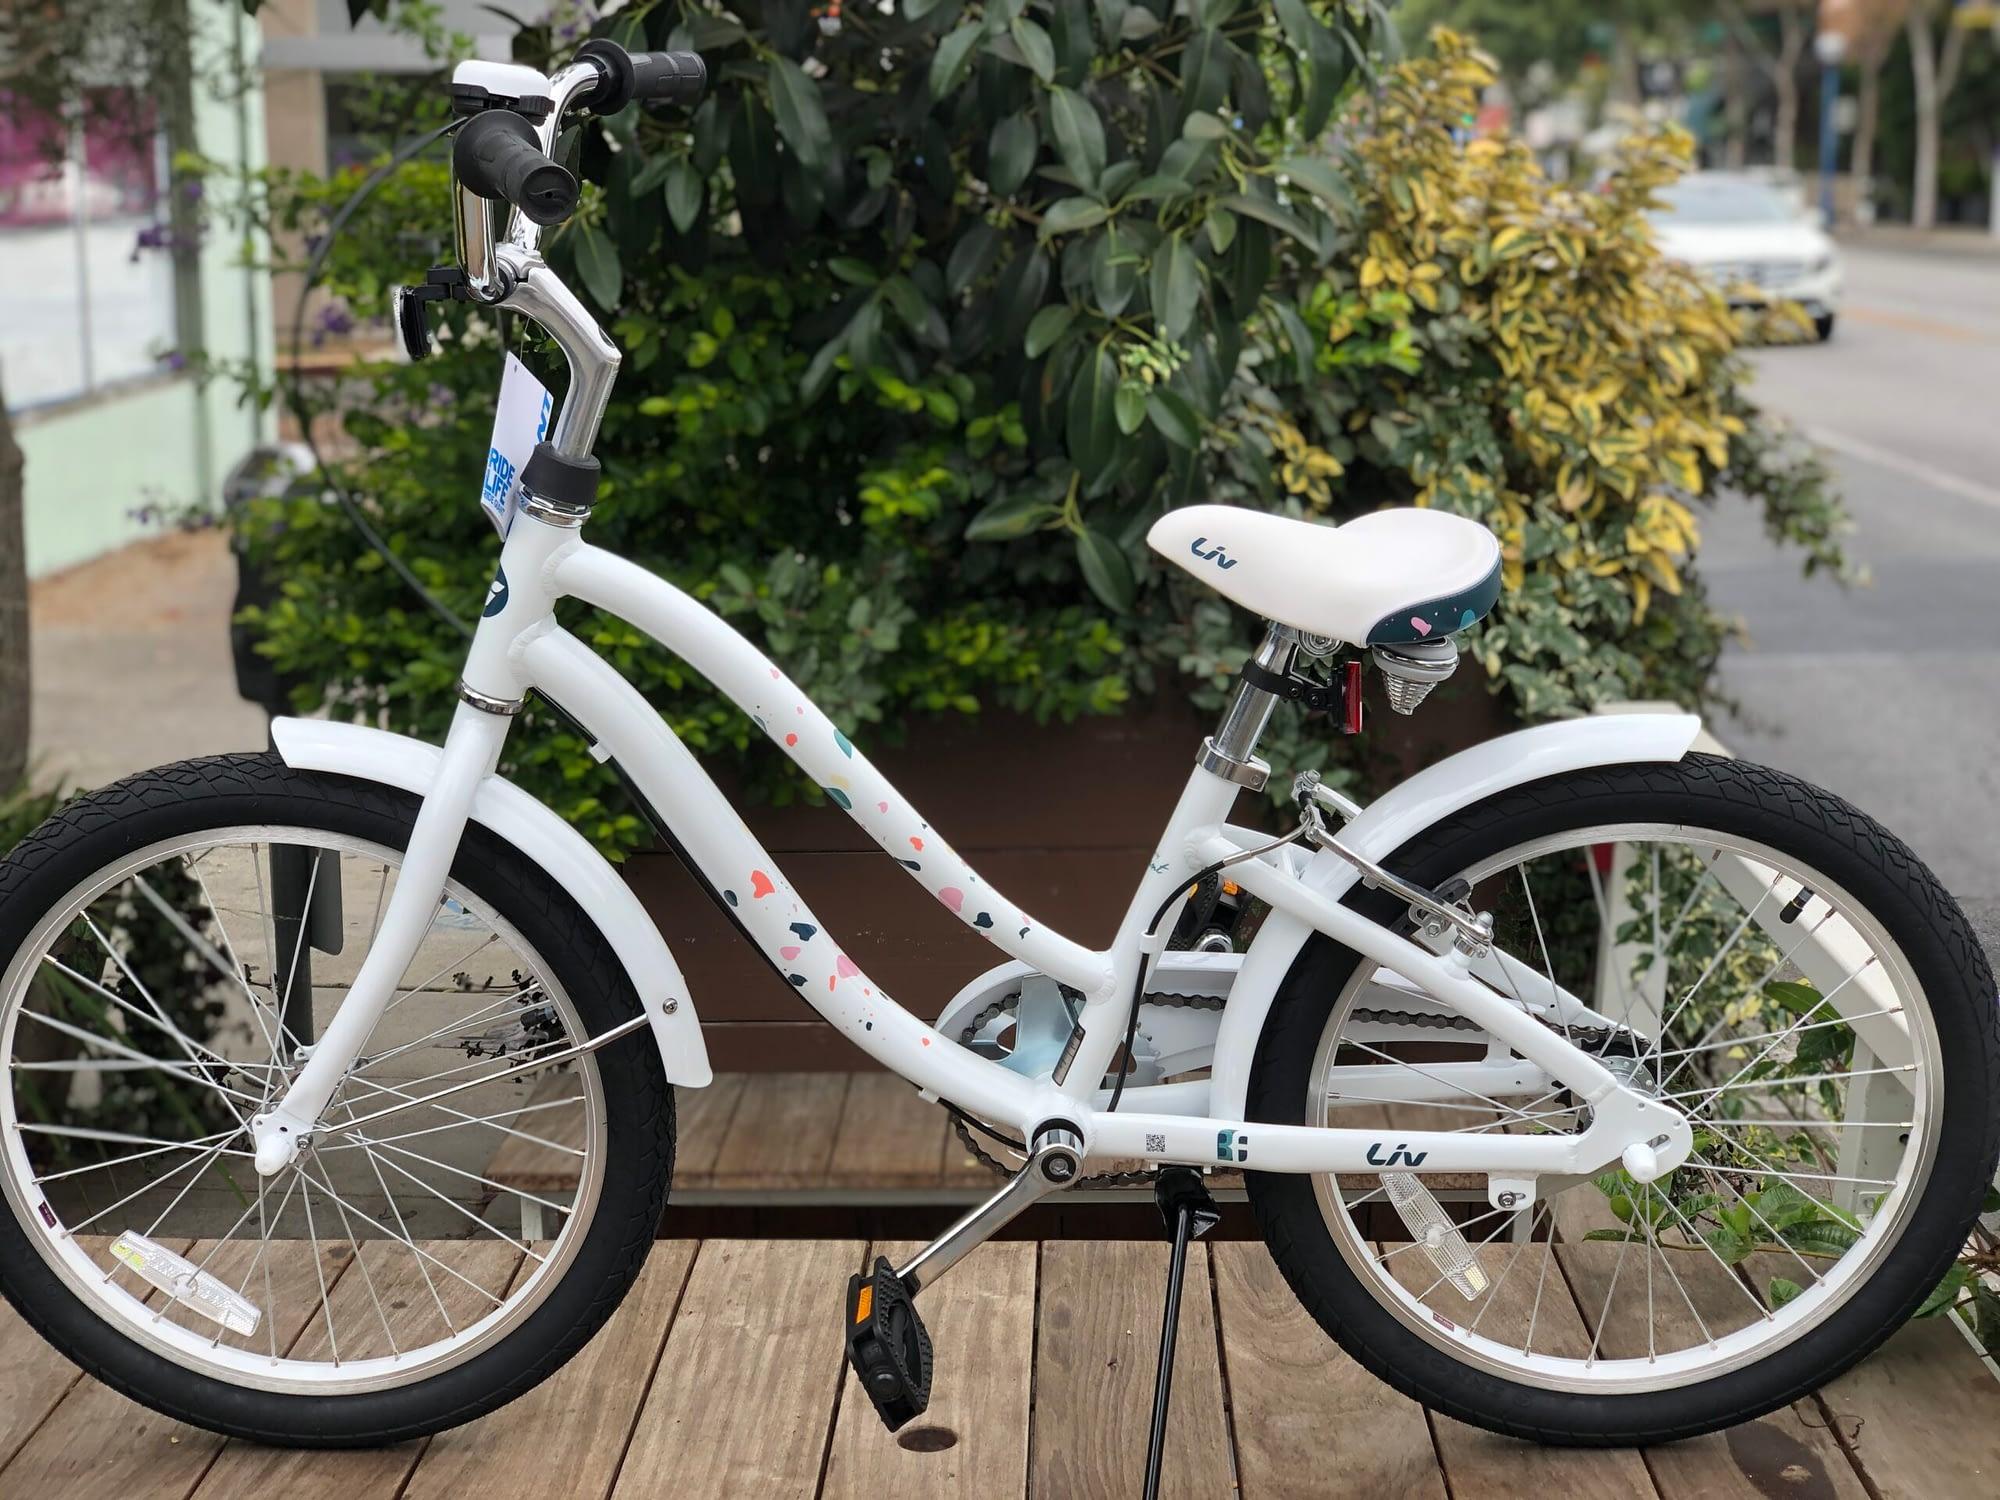 brand new liv kids bike available los angeles